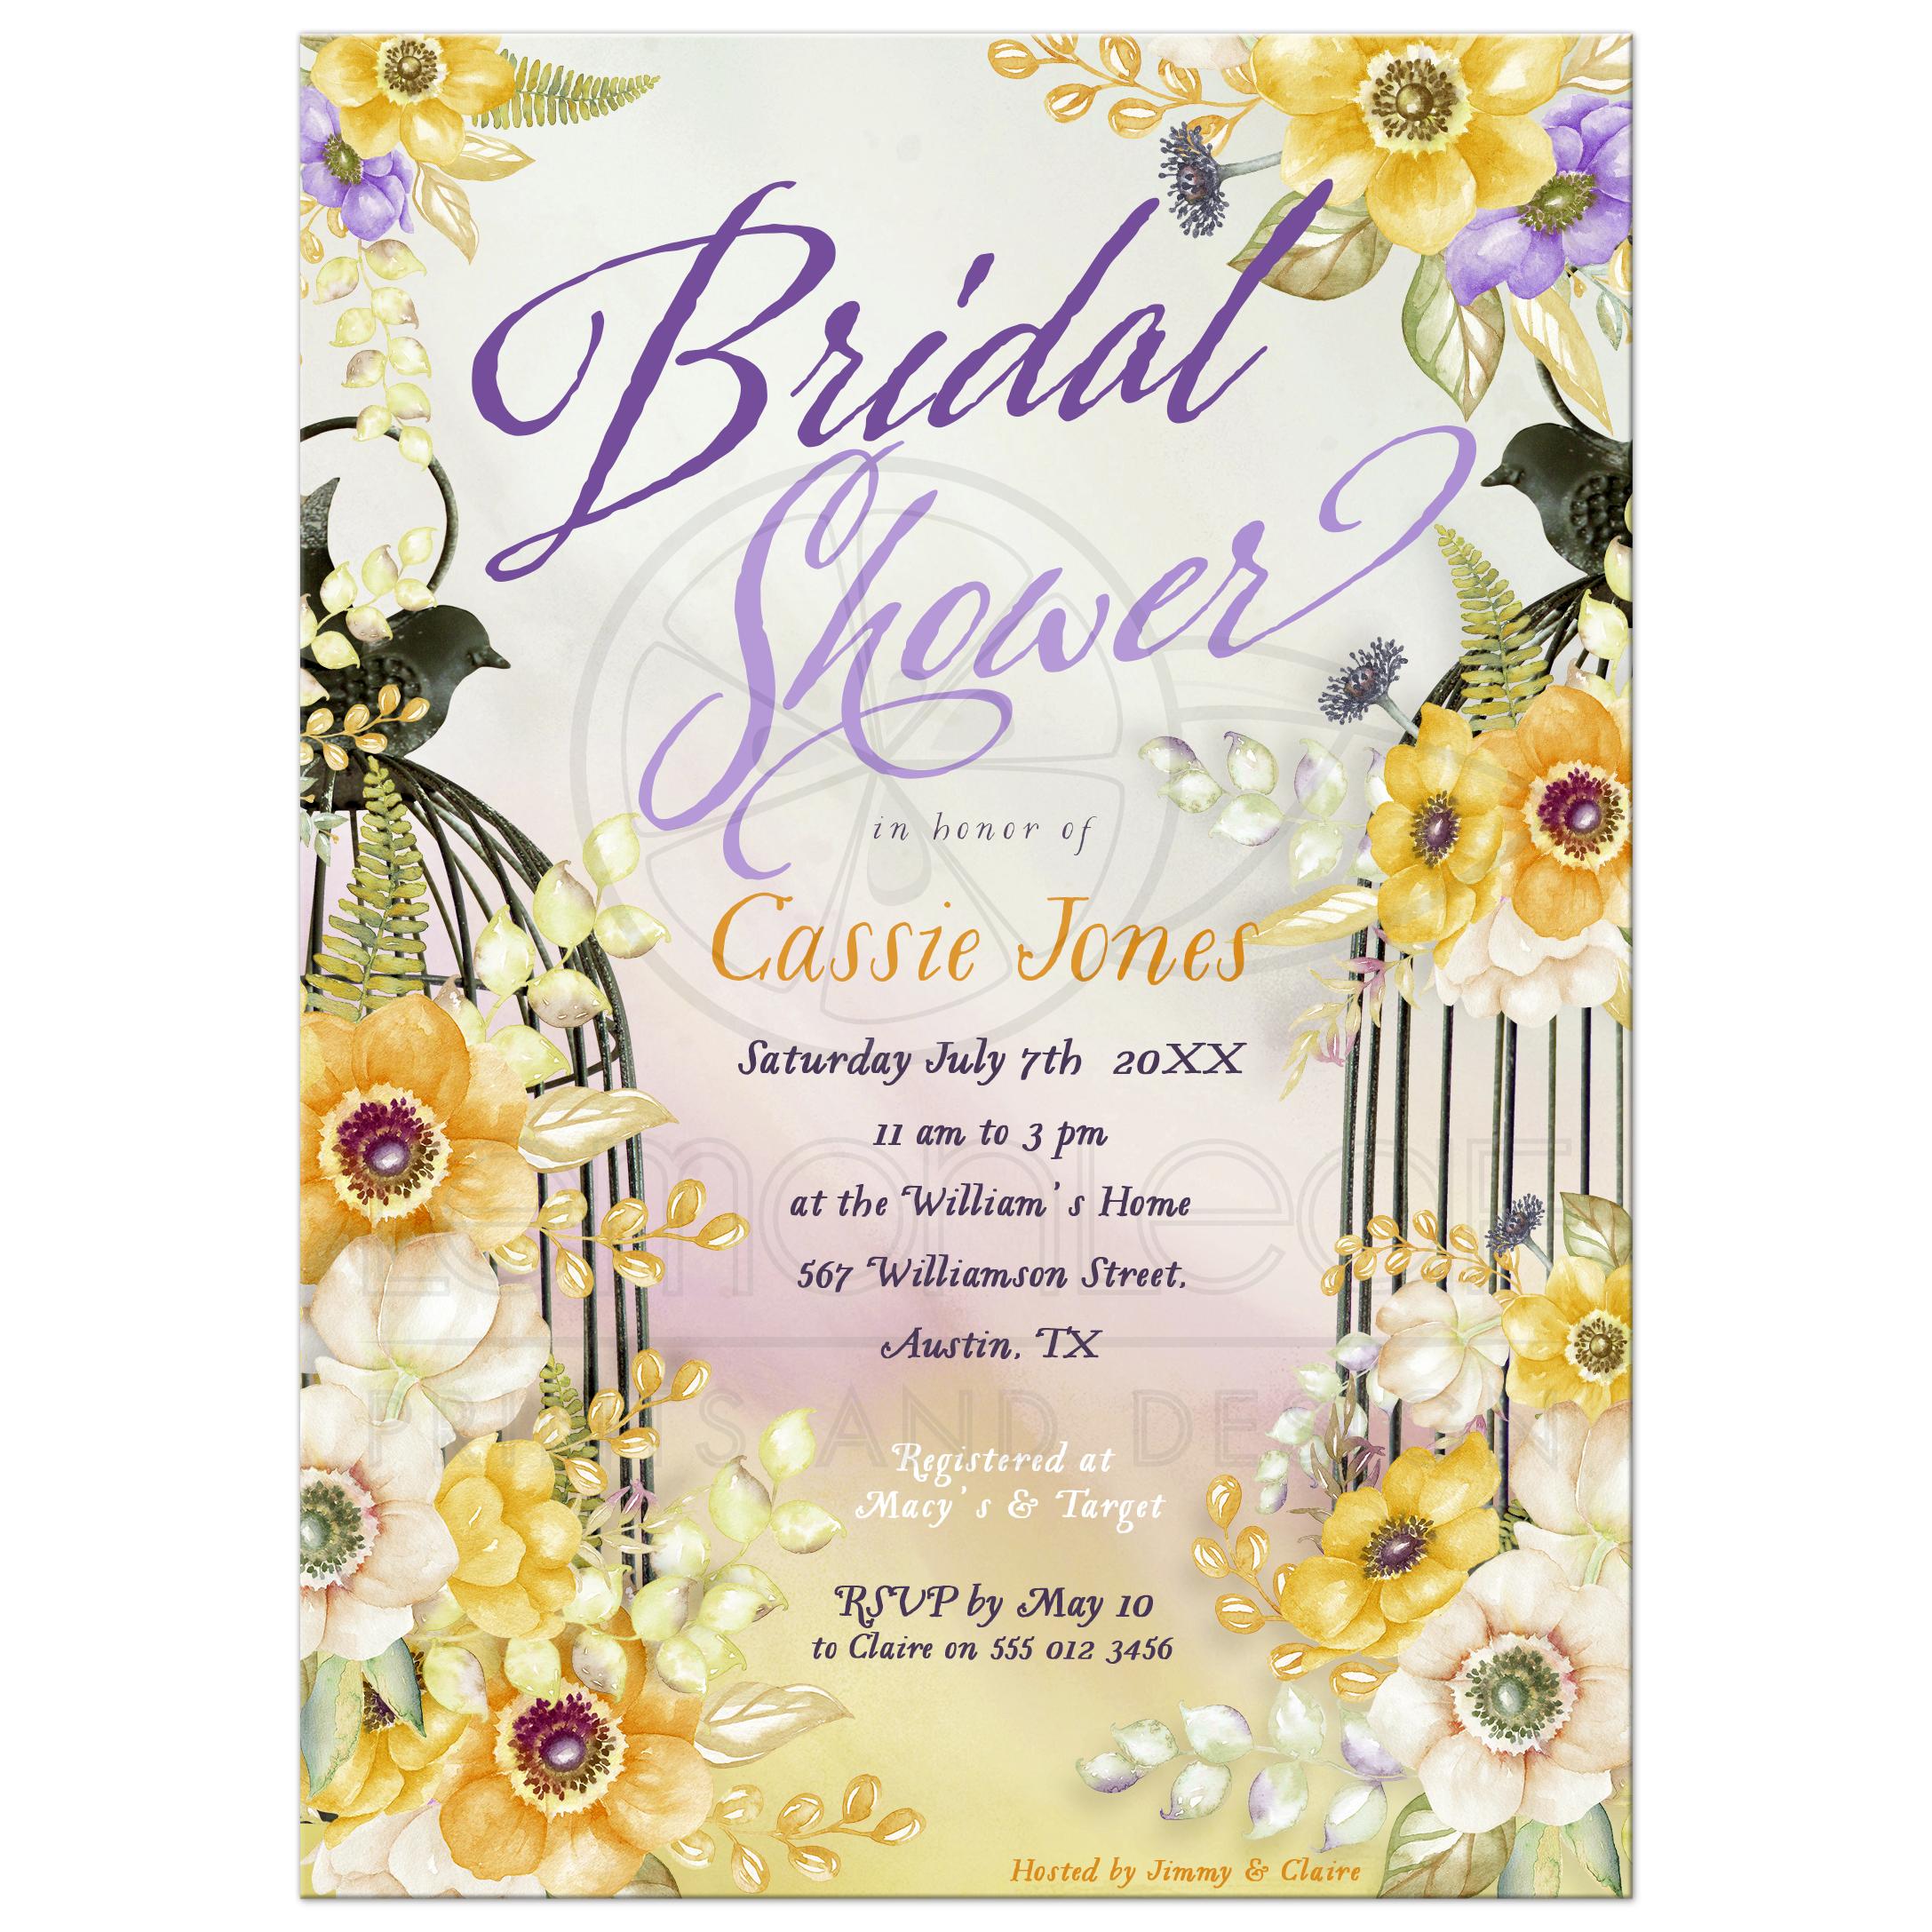 Floral Birdcage Bridal Shower Invitation   Yellow Orange & Purple